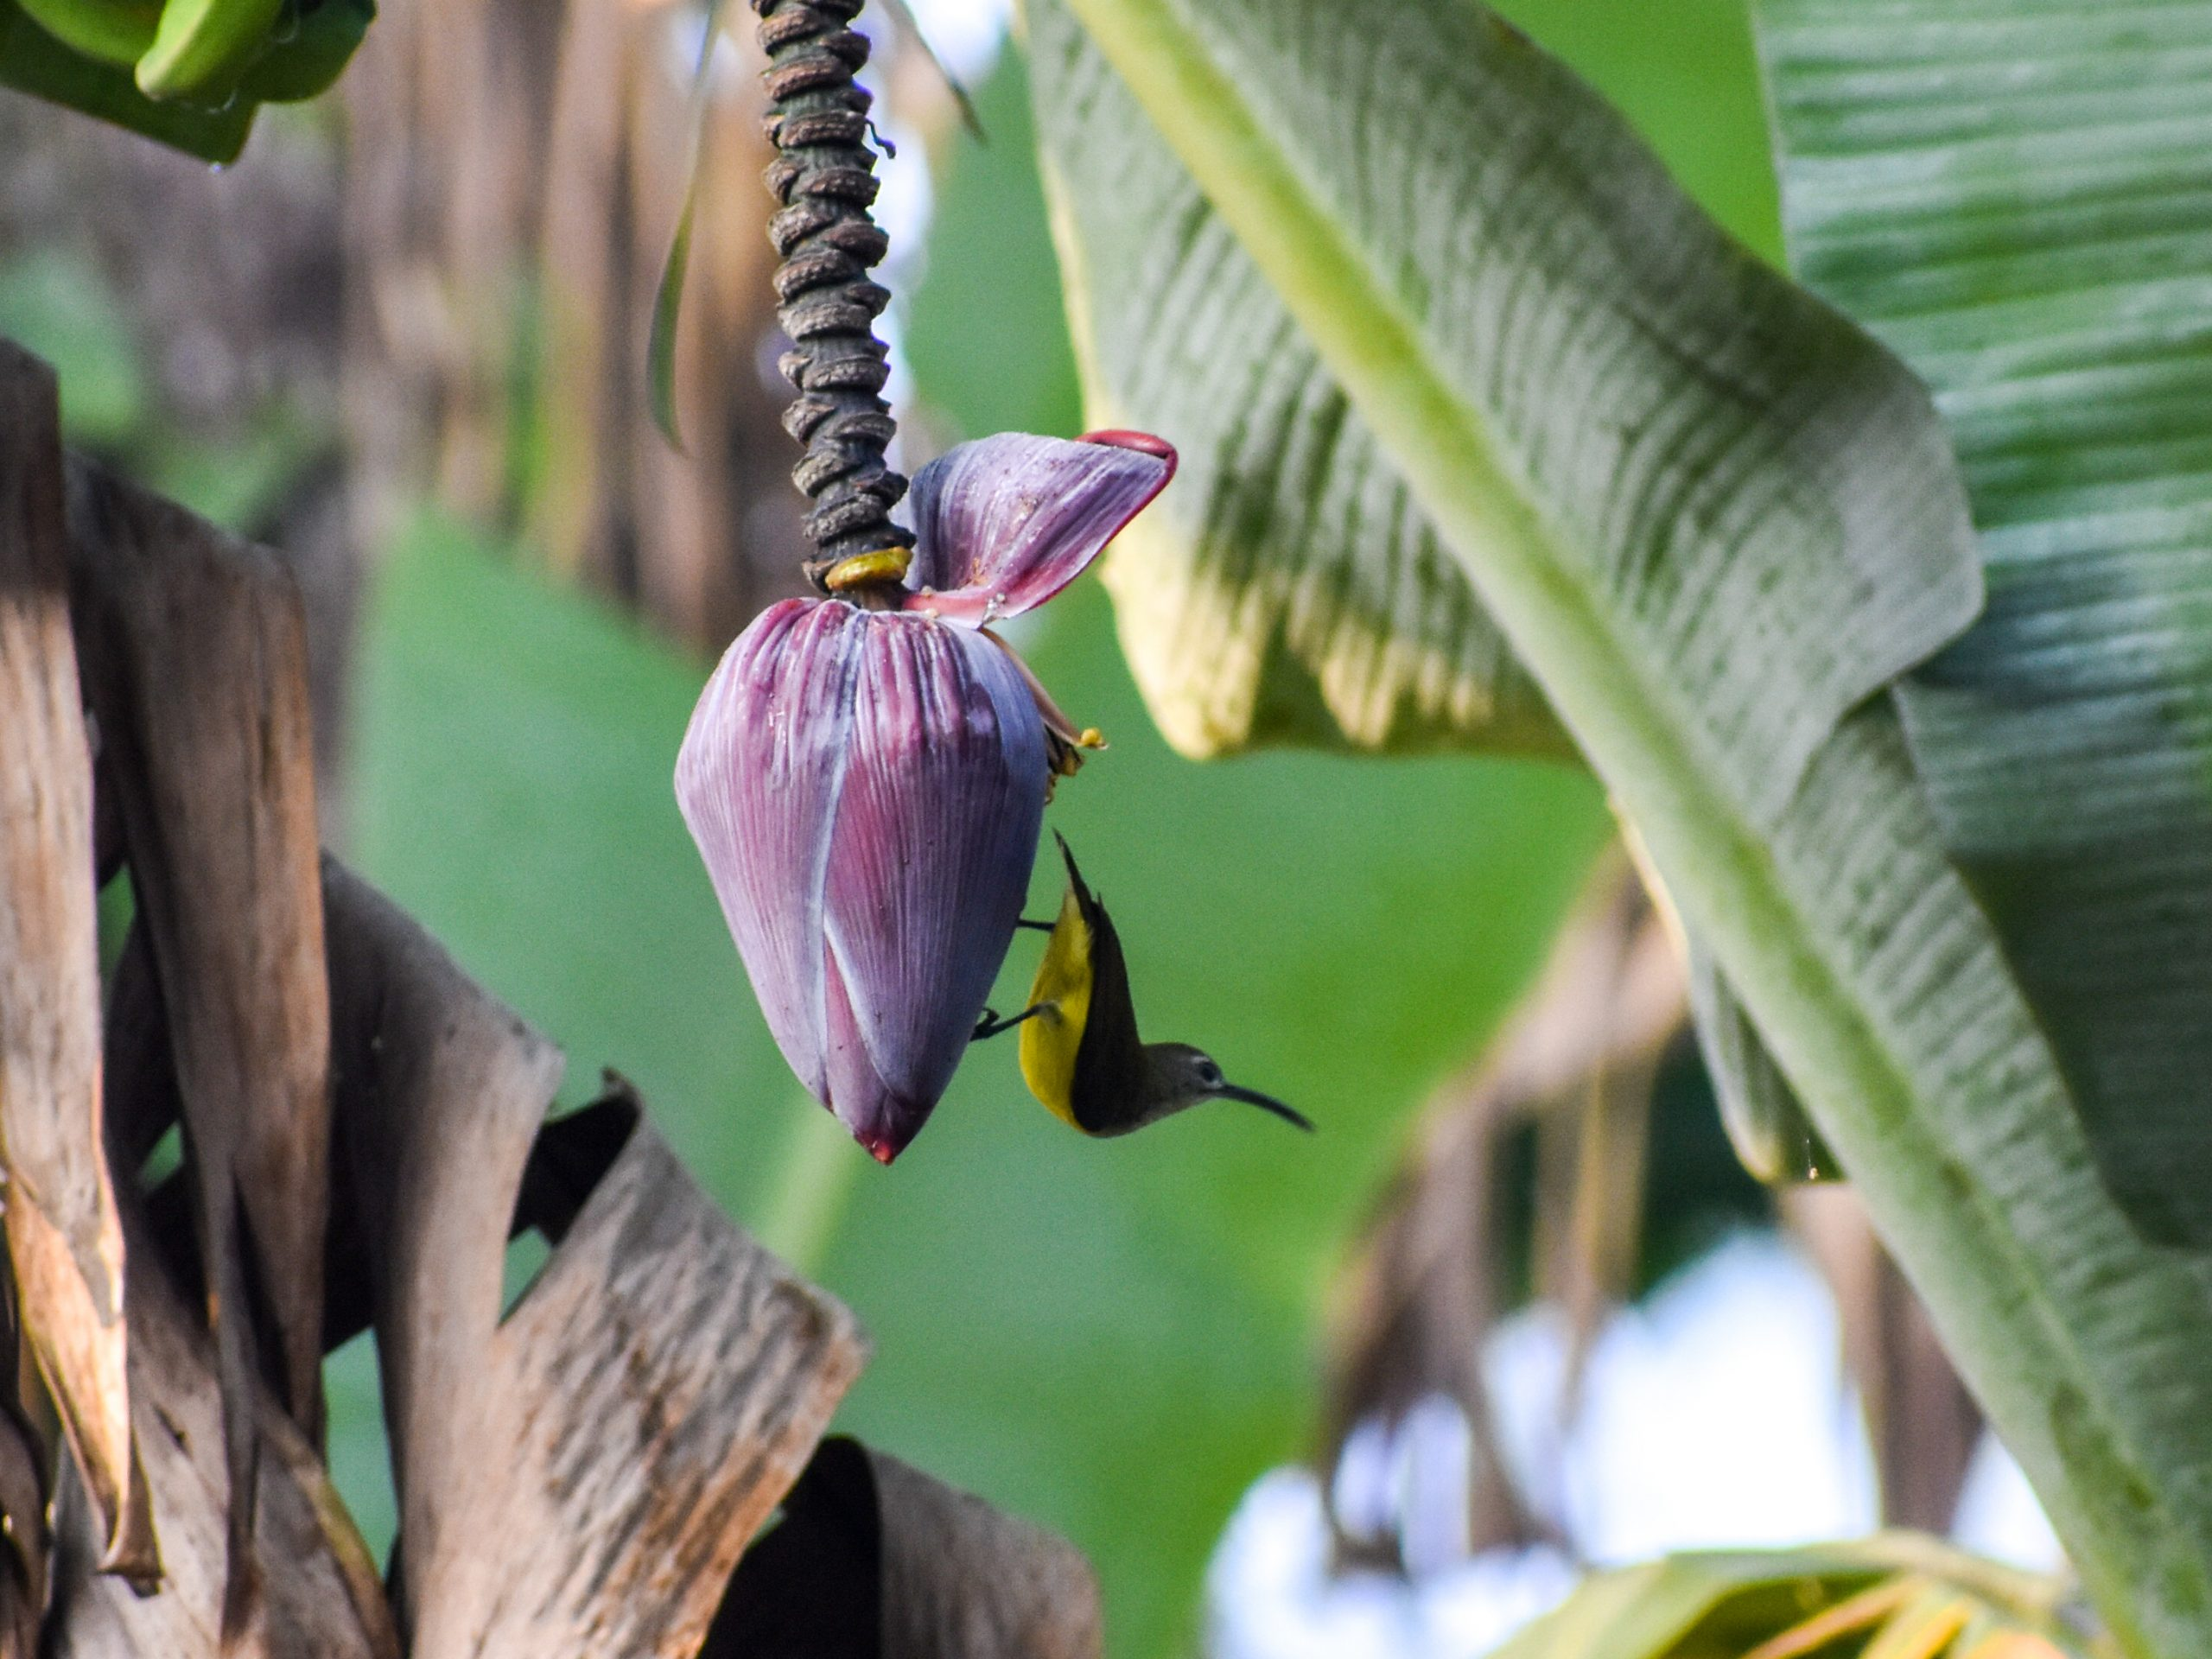 Banana flower hanging